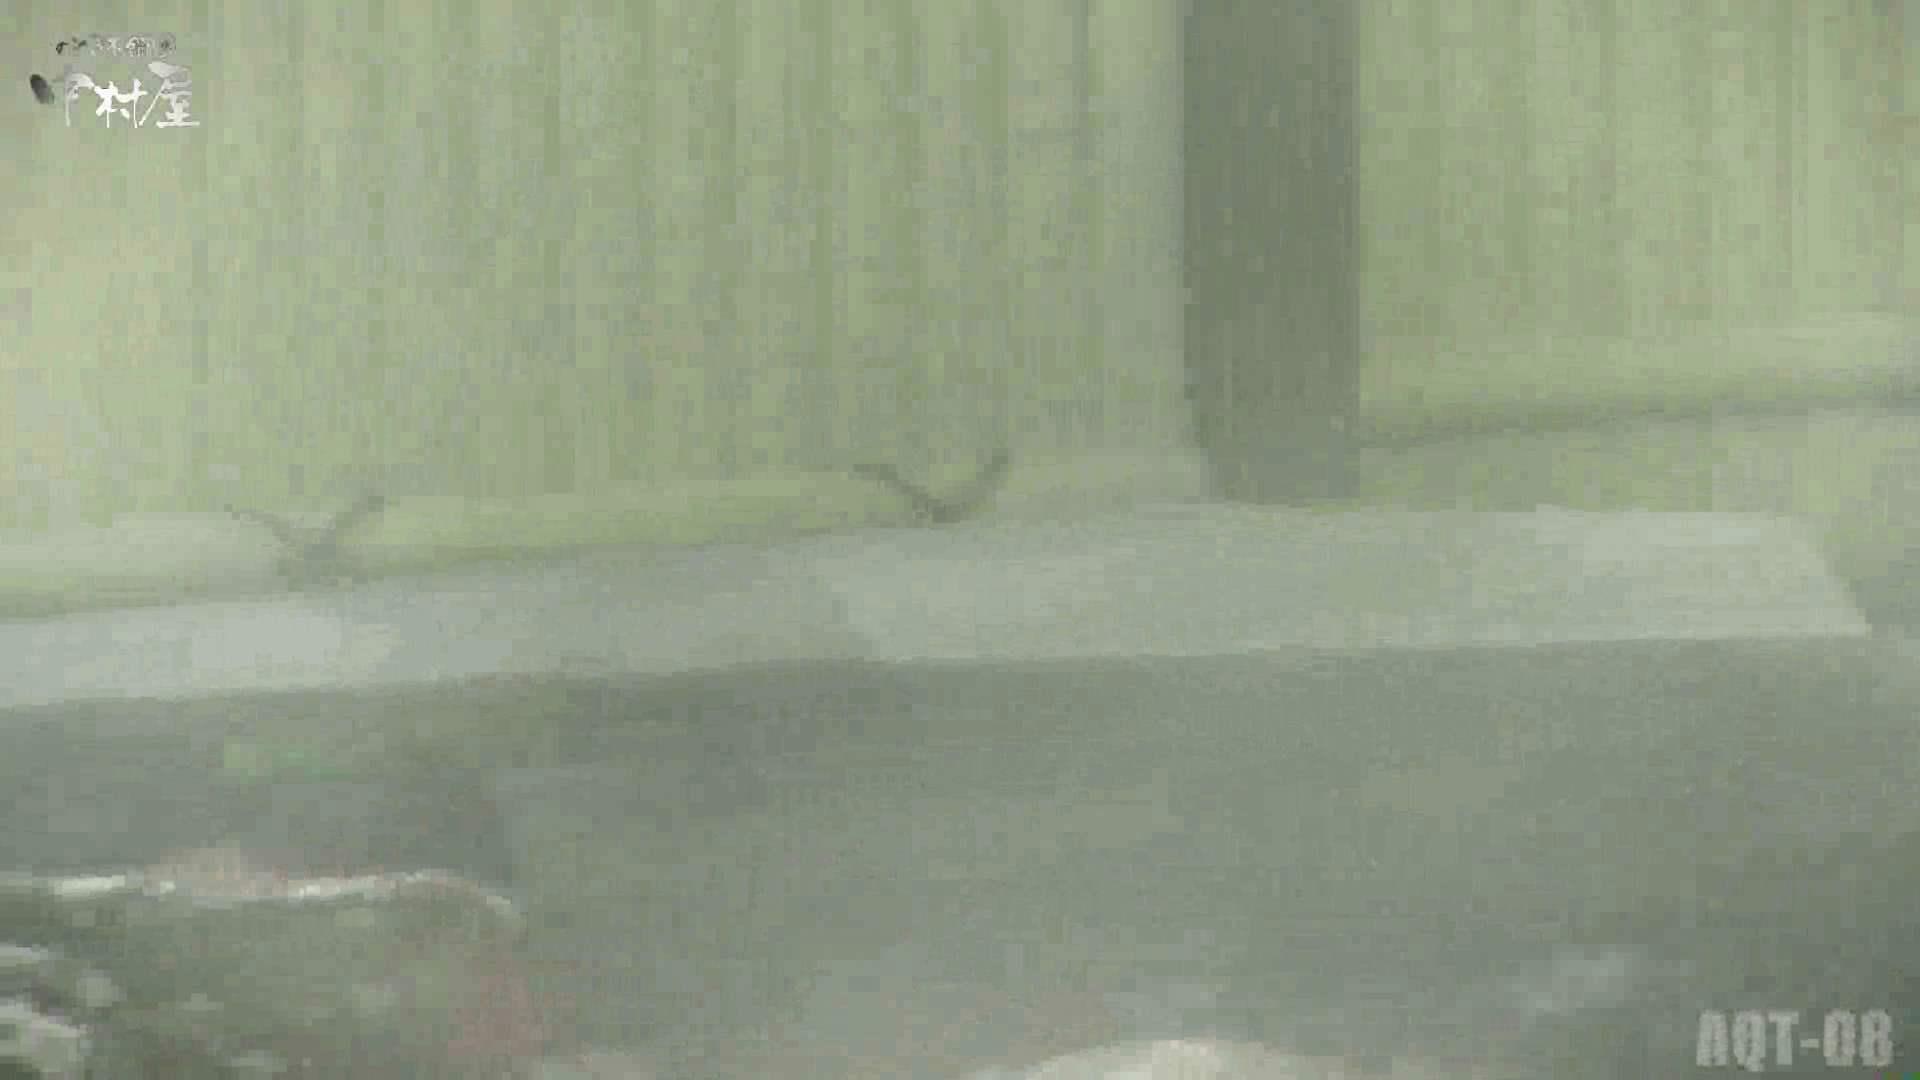 Aquaな露天風呂Vol.872潜入盗撮露天風呂八判湯 其の五 盗撮 AV無料動画キャプチャ 110枚 19